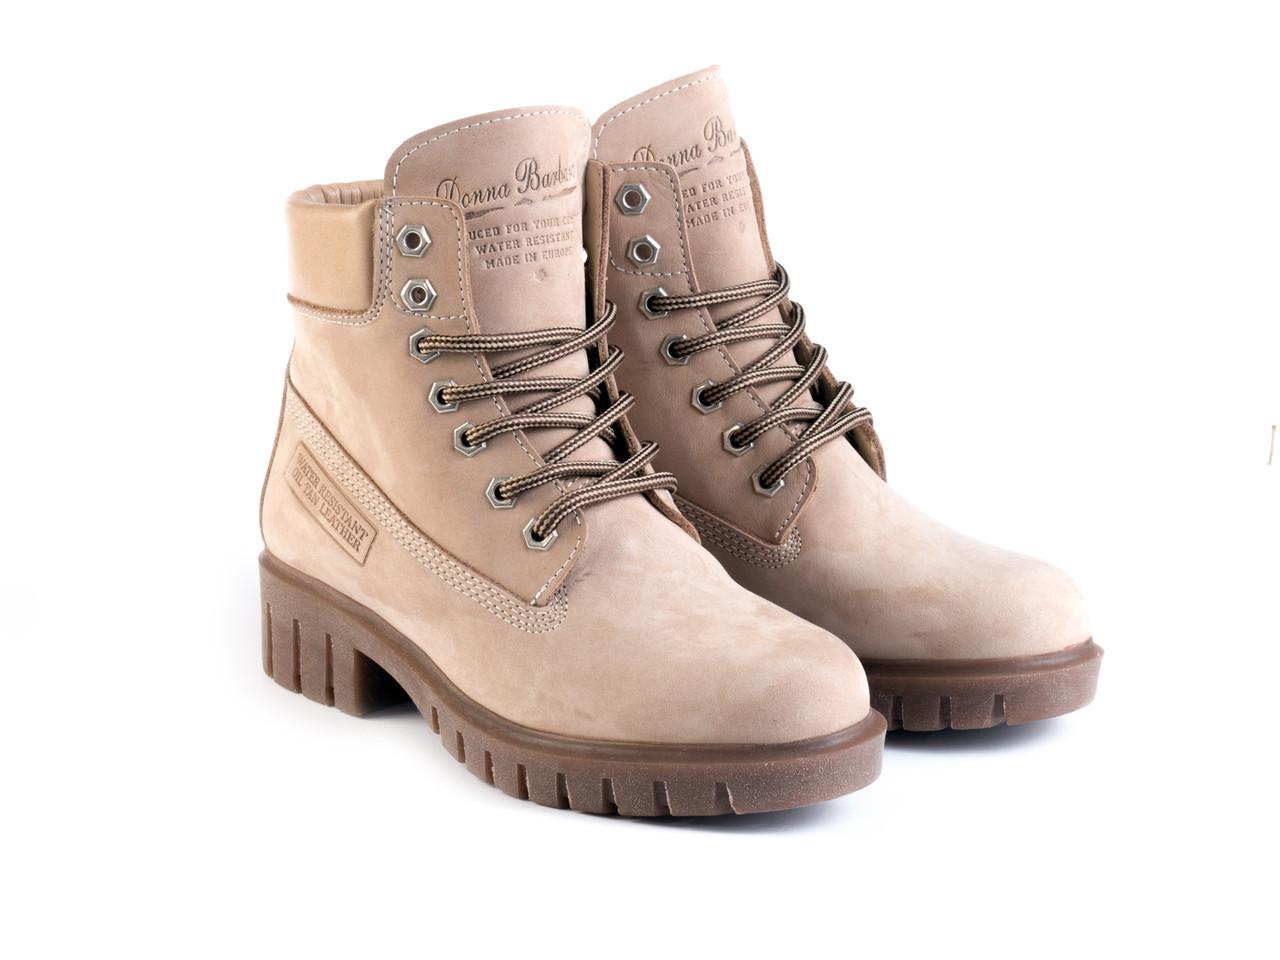 Ботинки Etor 5169-21554-832 38 бежевые